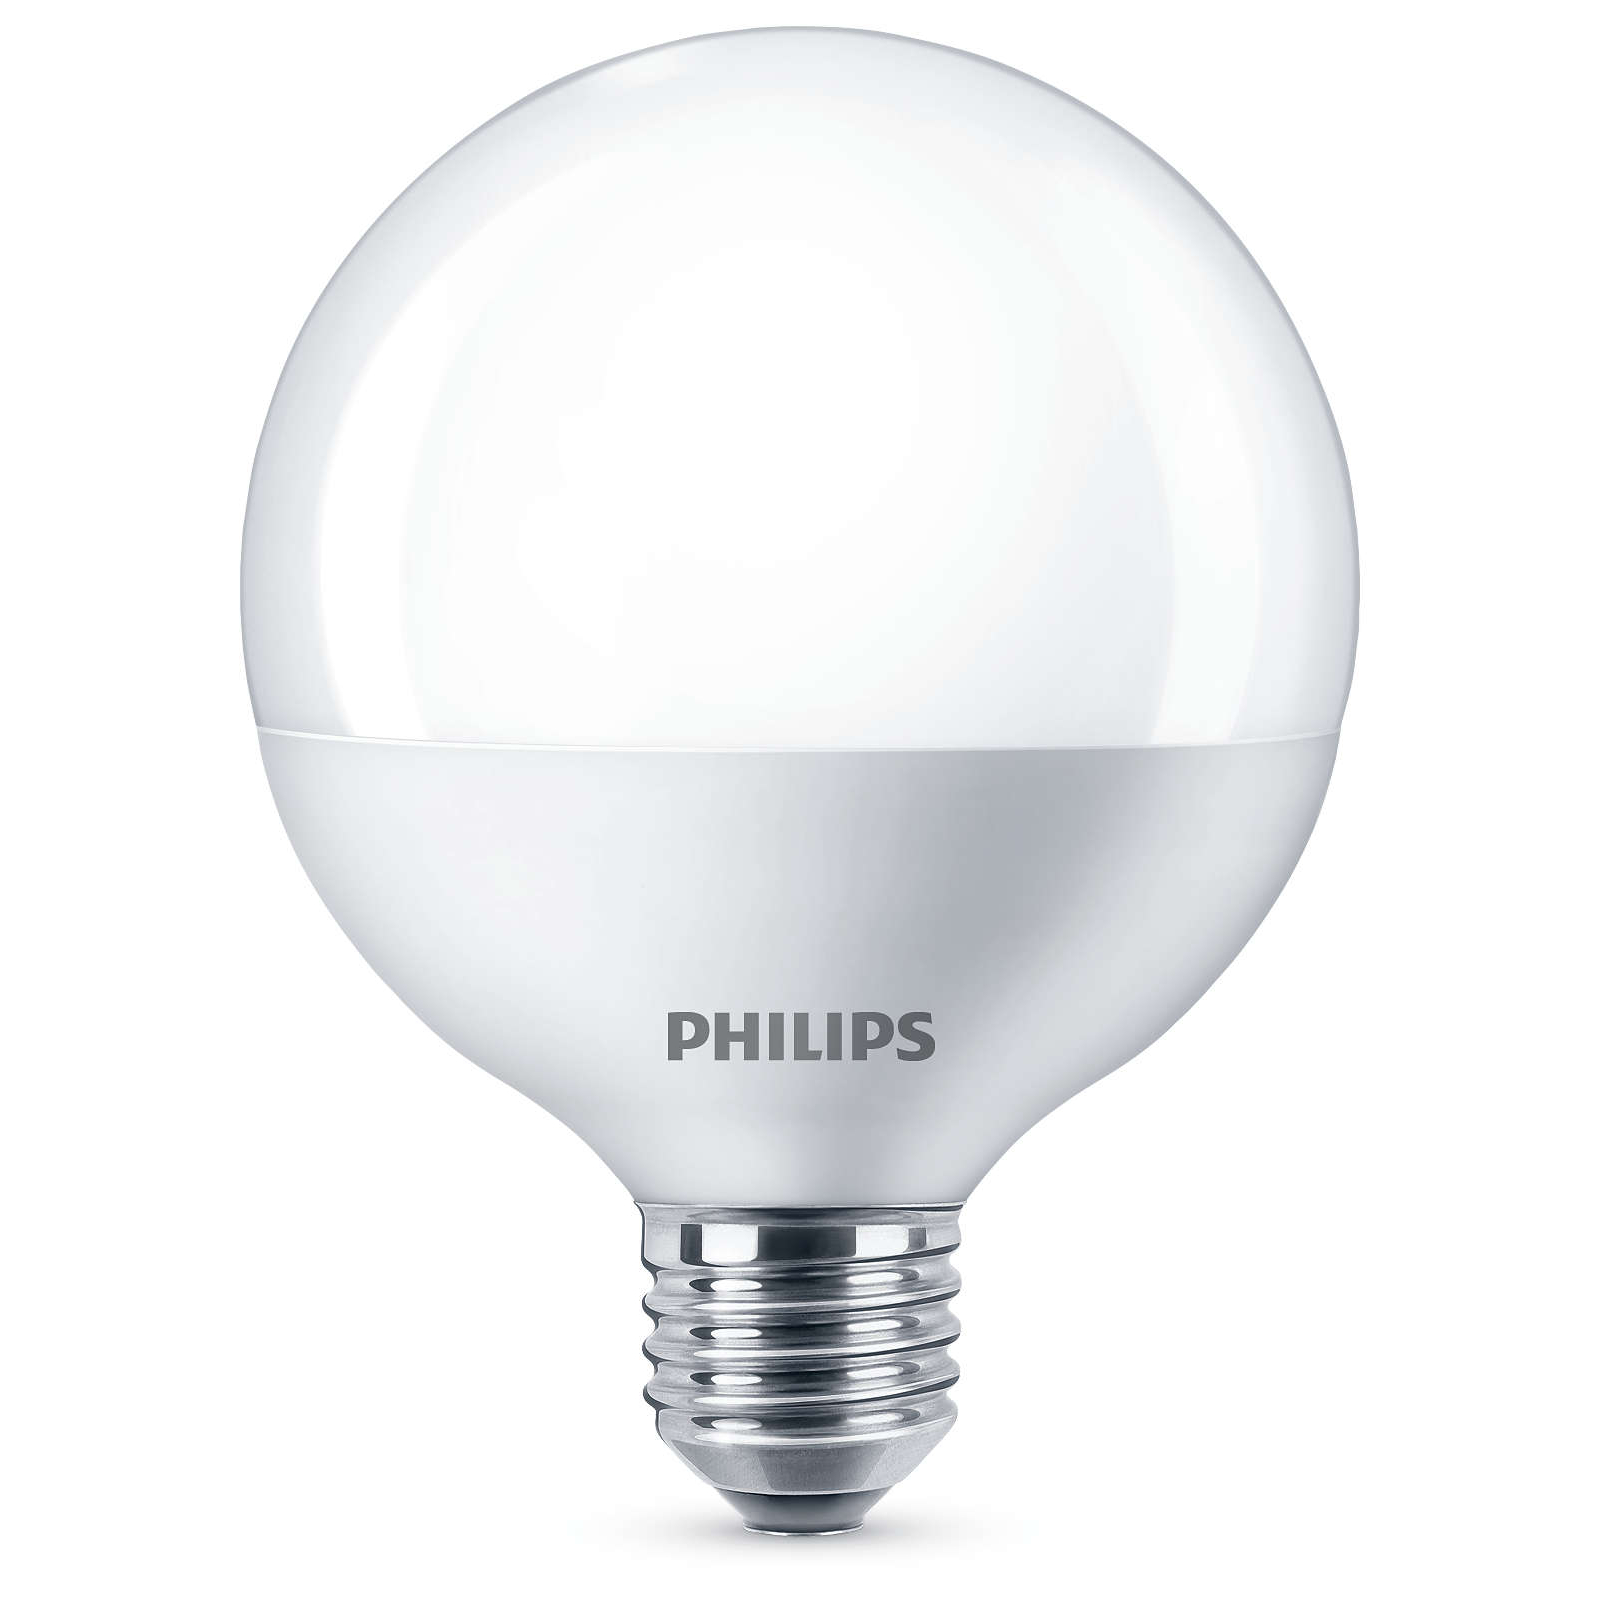 Philips LED Globe 60W G93 Frosted E27 Edison Screw Light ...